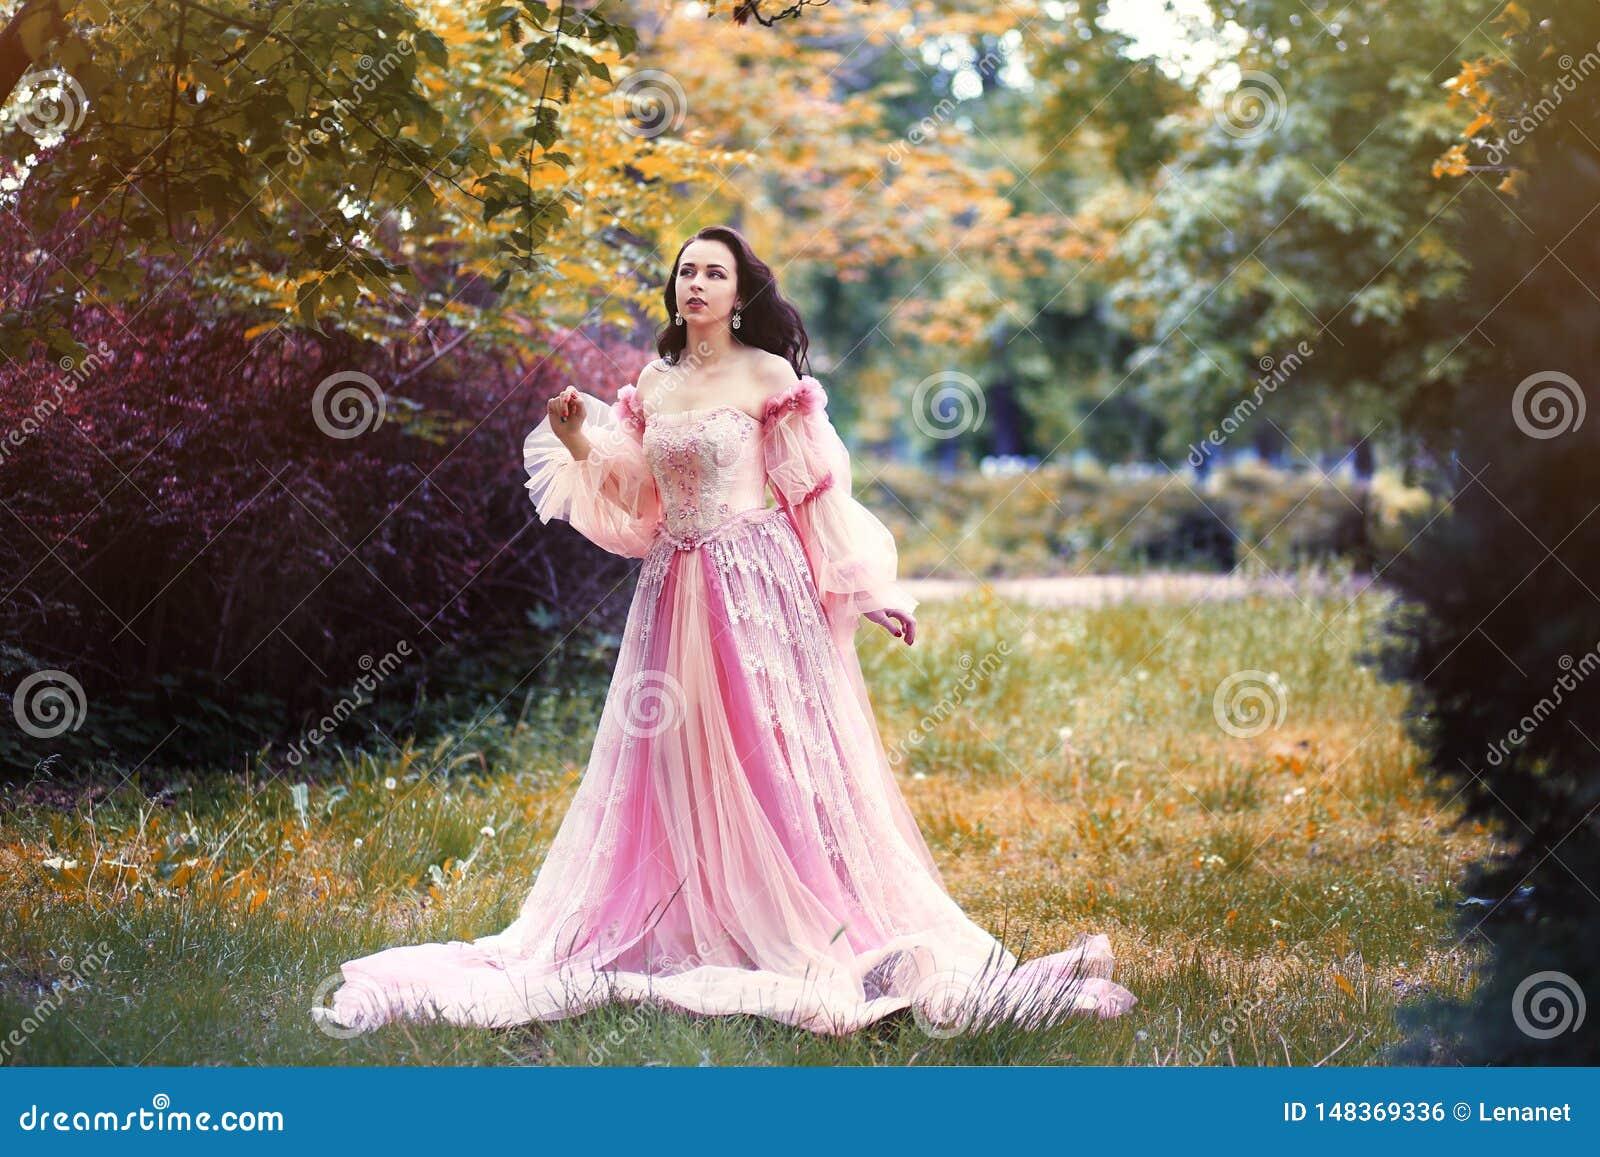 Woman in romantic pink dress